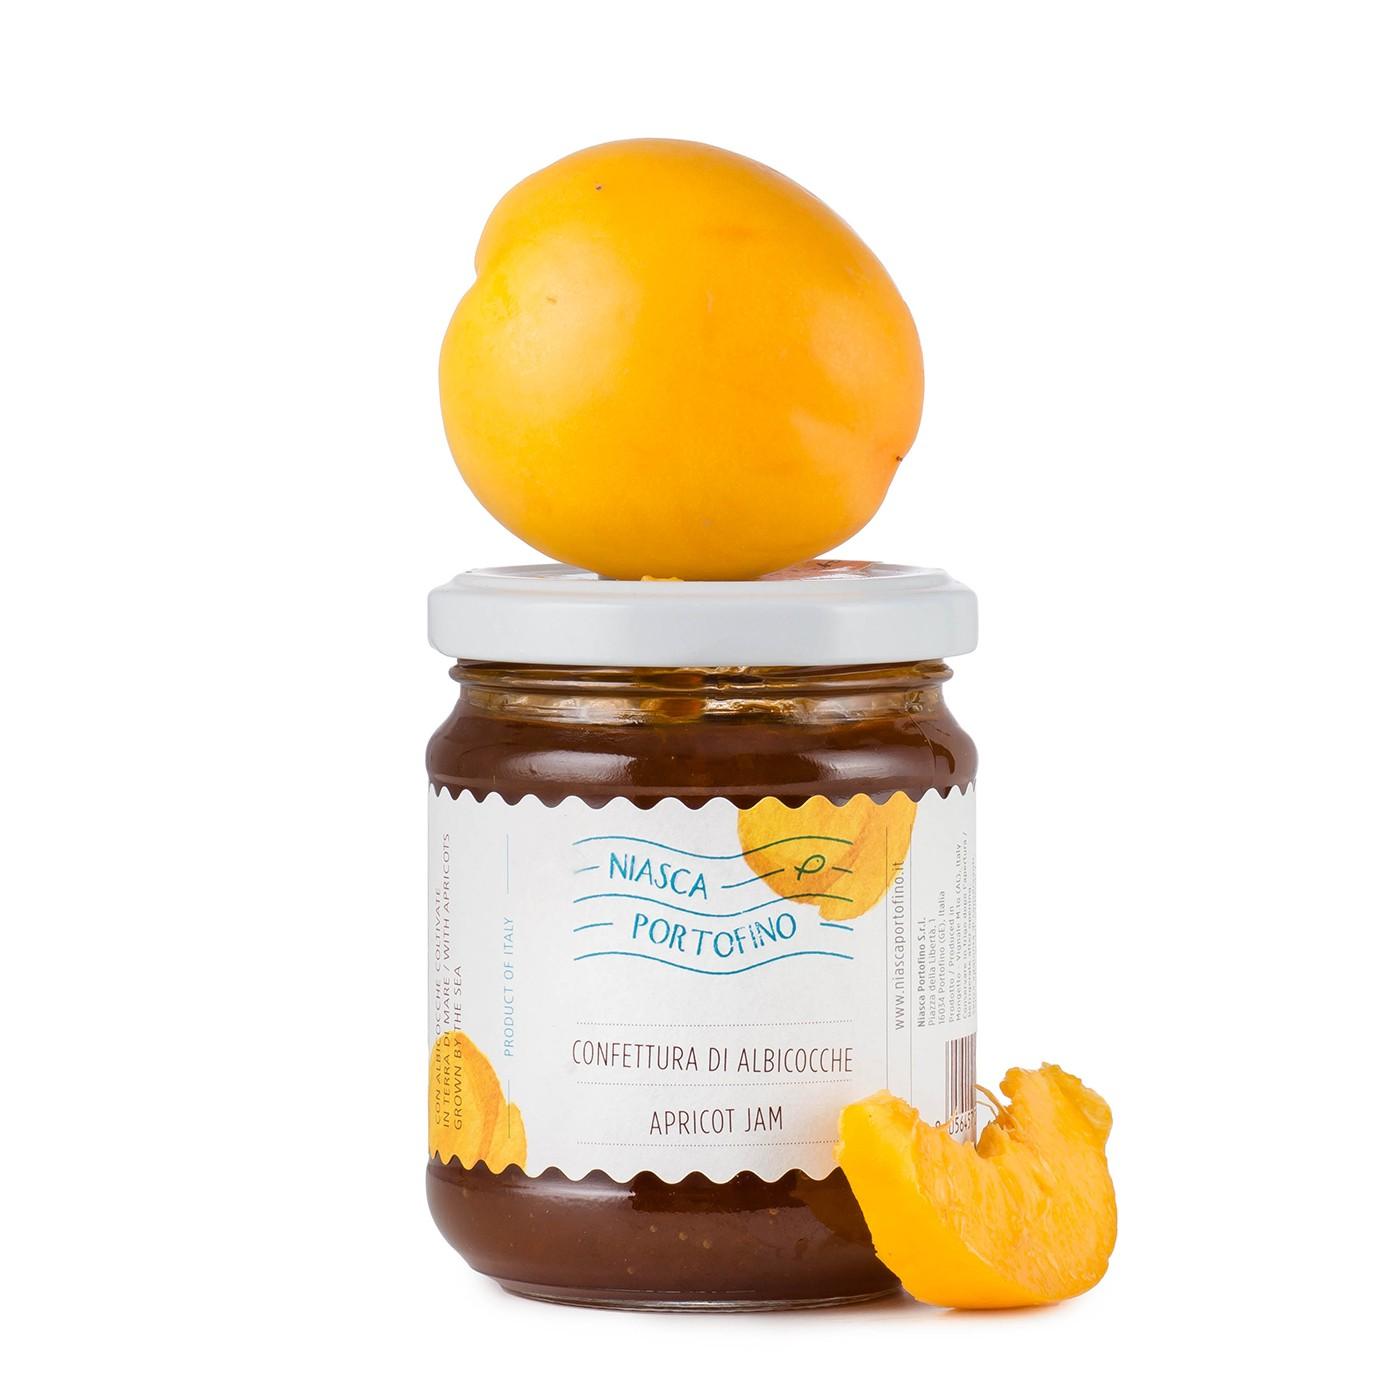 Apricot Jam 7.1 oz